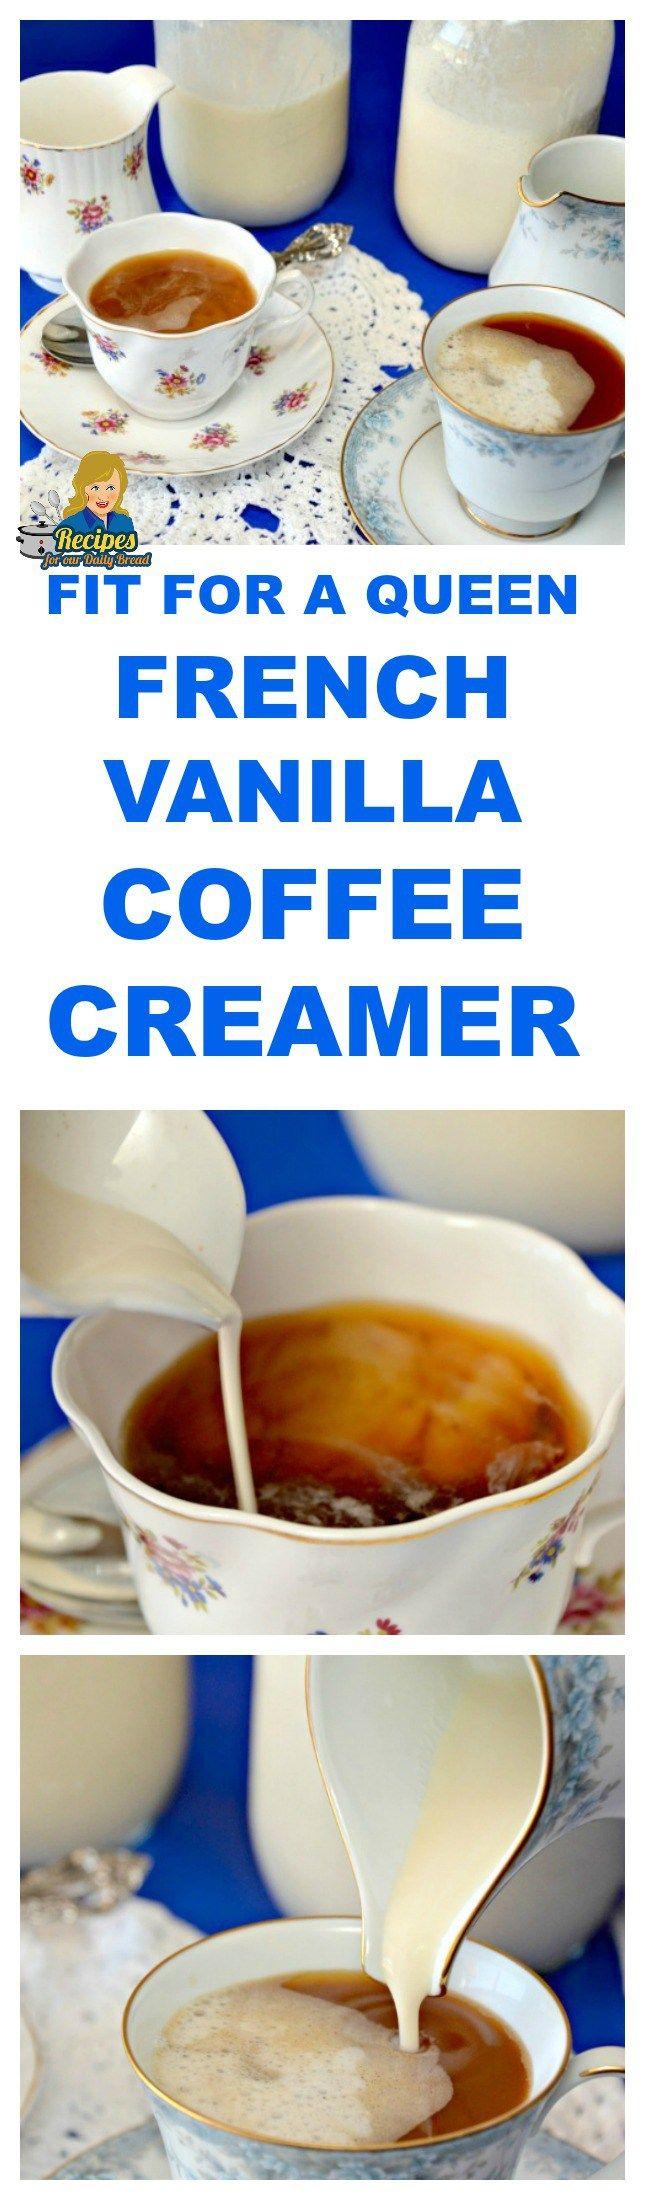 Fit for a queen french vanilla coffee creamer #frenchvanillacreamerrecipe